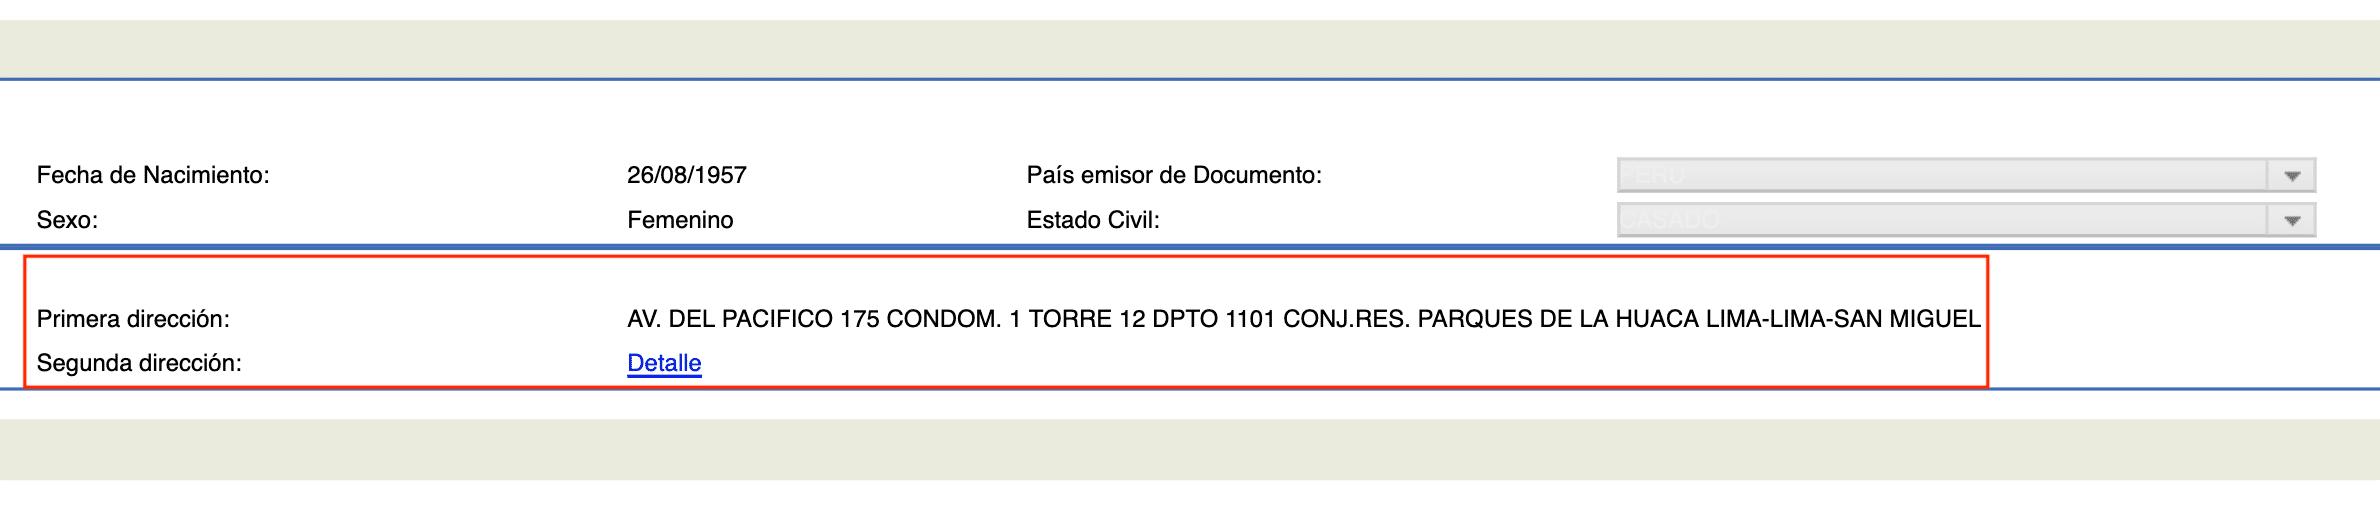 T-Registro Segunda Direccion